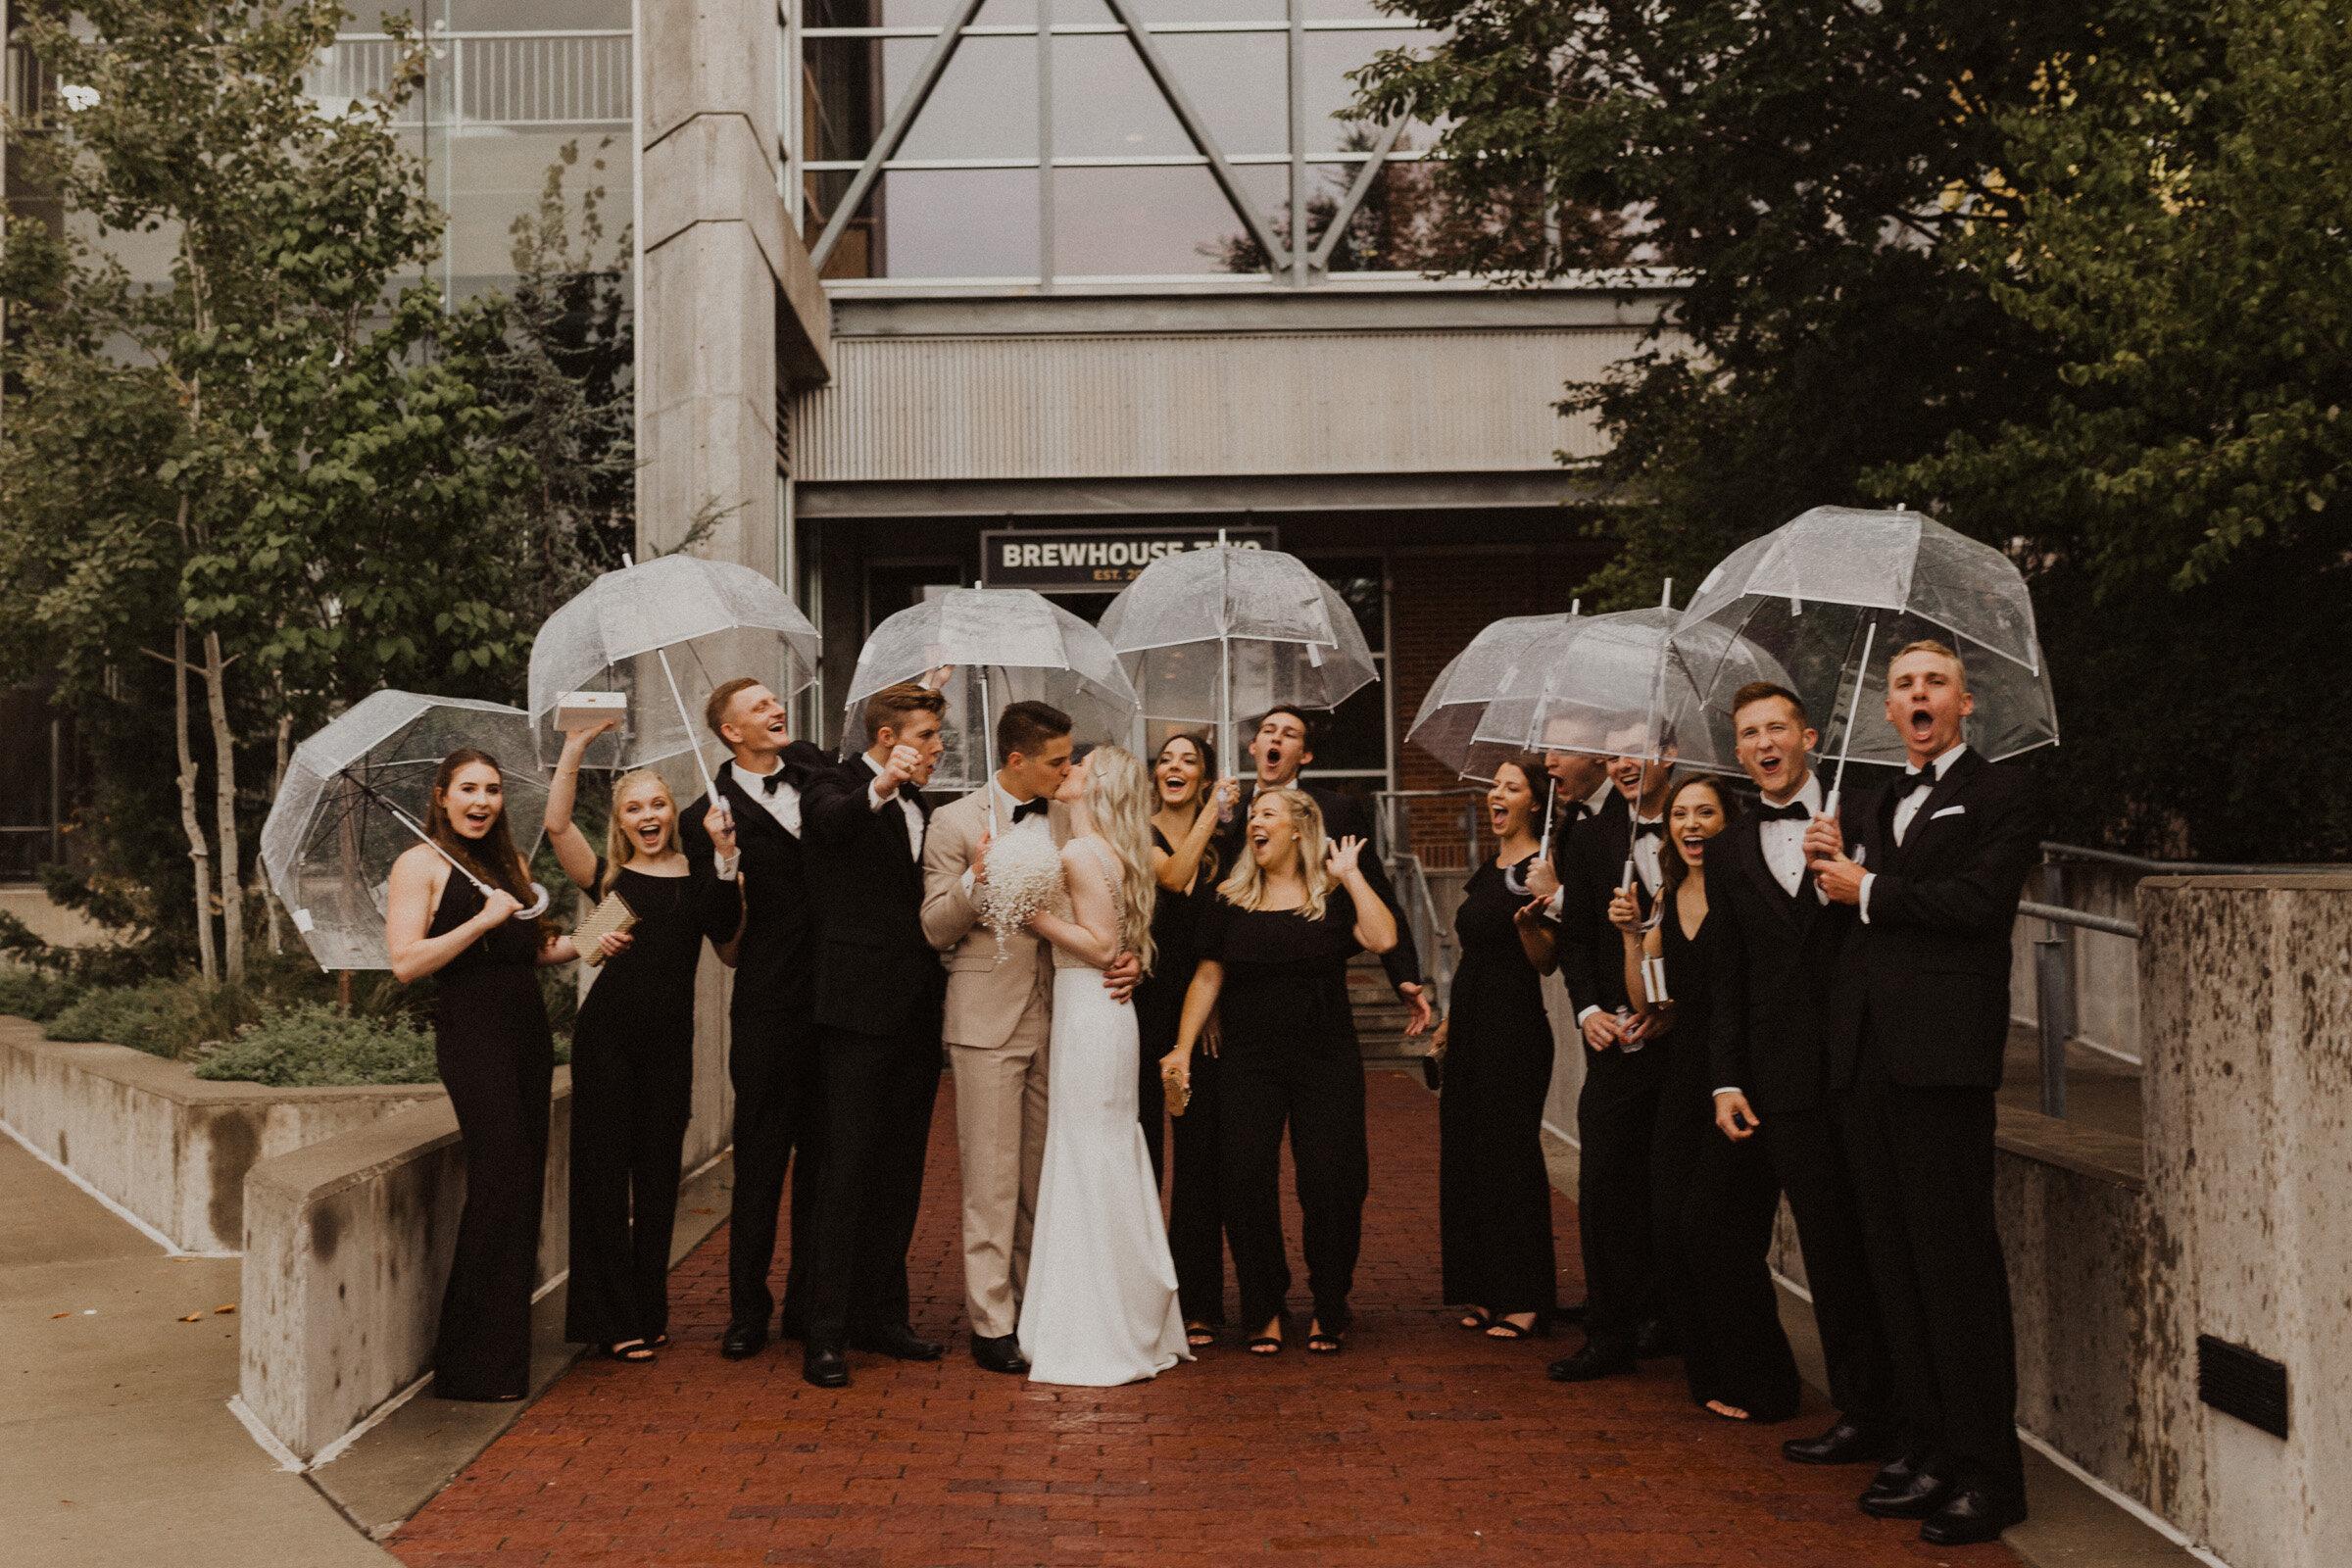 alyssa barletter photography downtown kansas city wedding boulevard brewery reception rainy day wedding-46.jpg